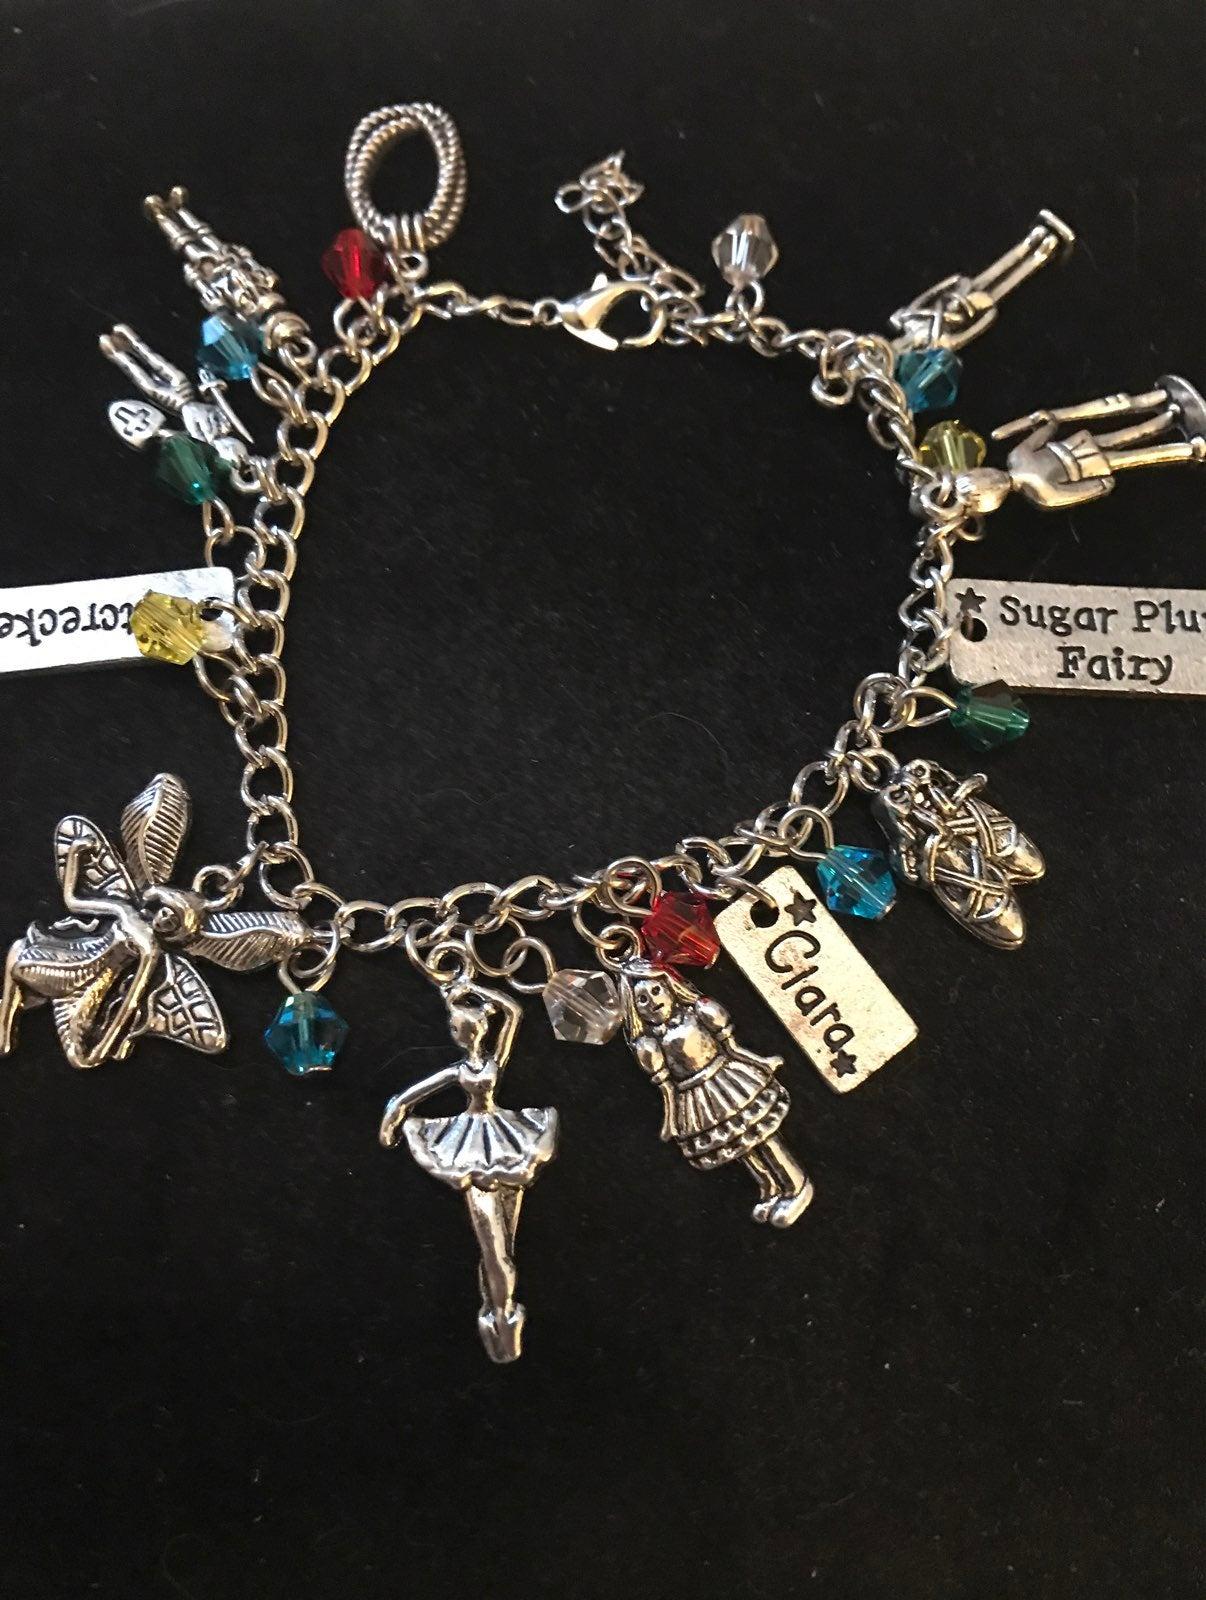 The nutcracker charm bracelet